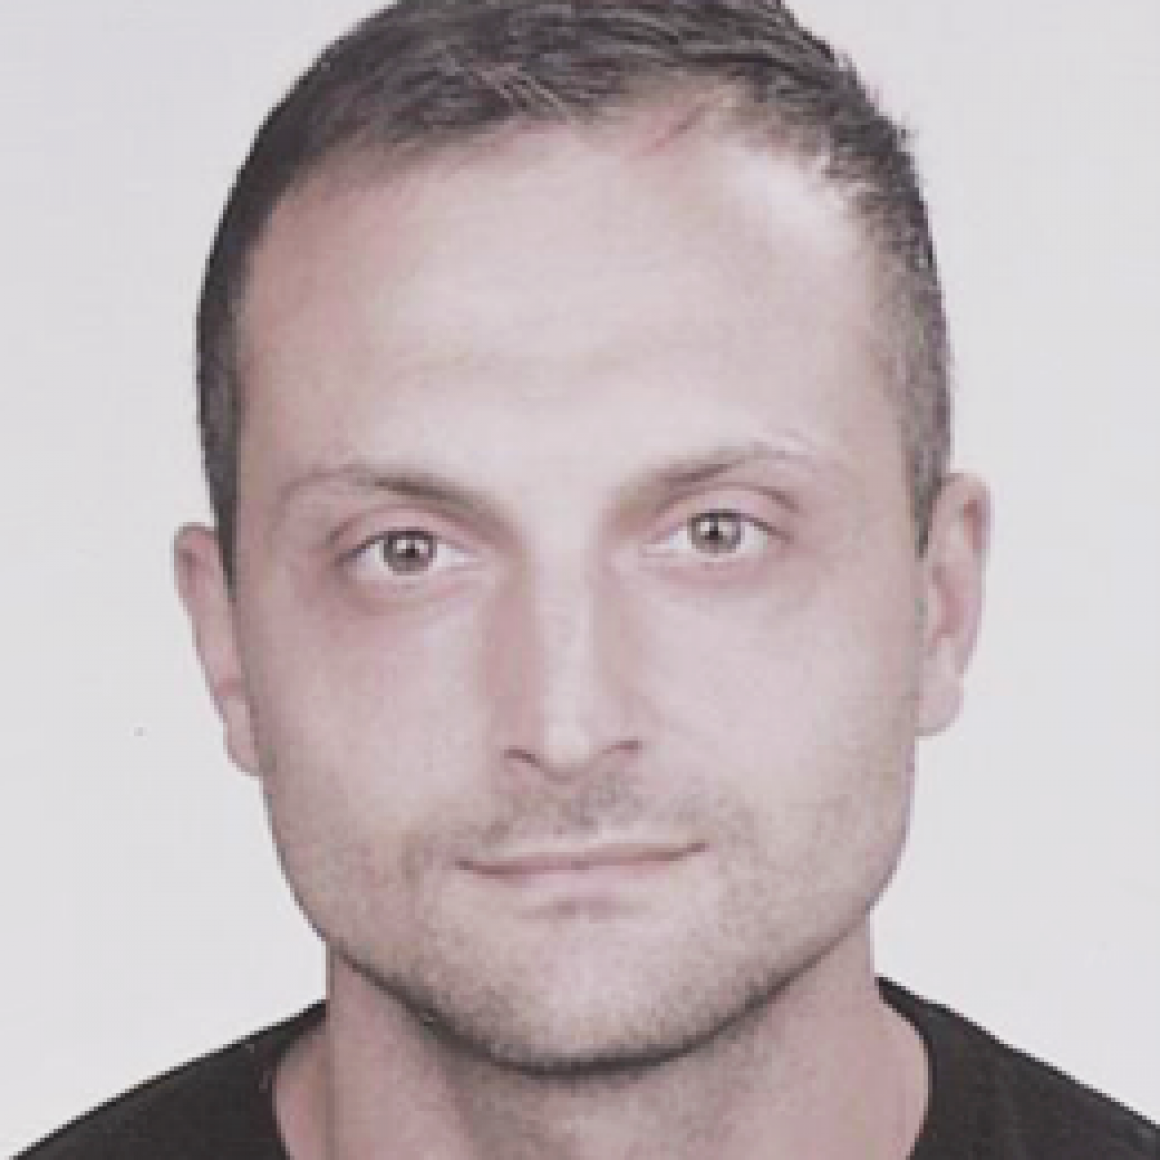 Jatc Greece Partner 26 Dejan Hanzekovic